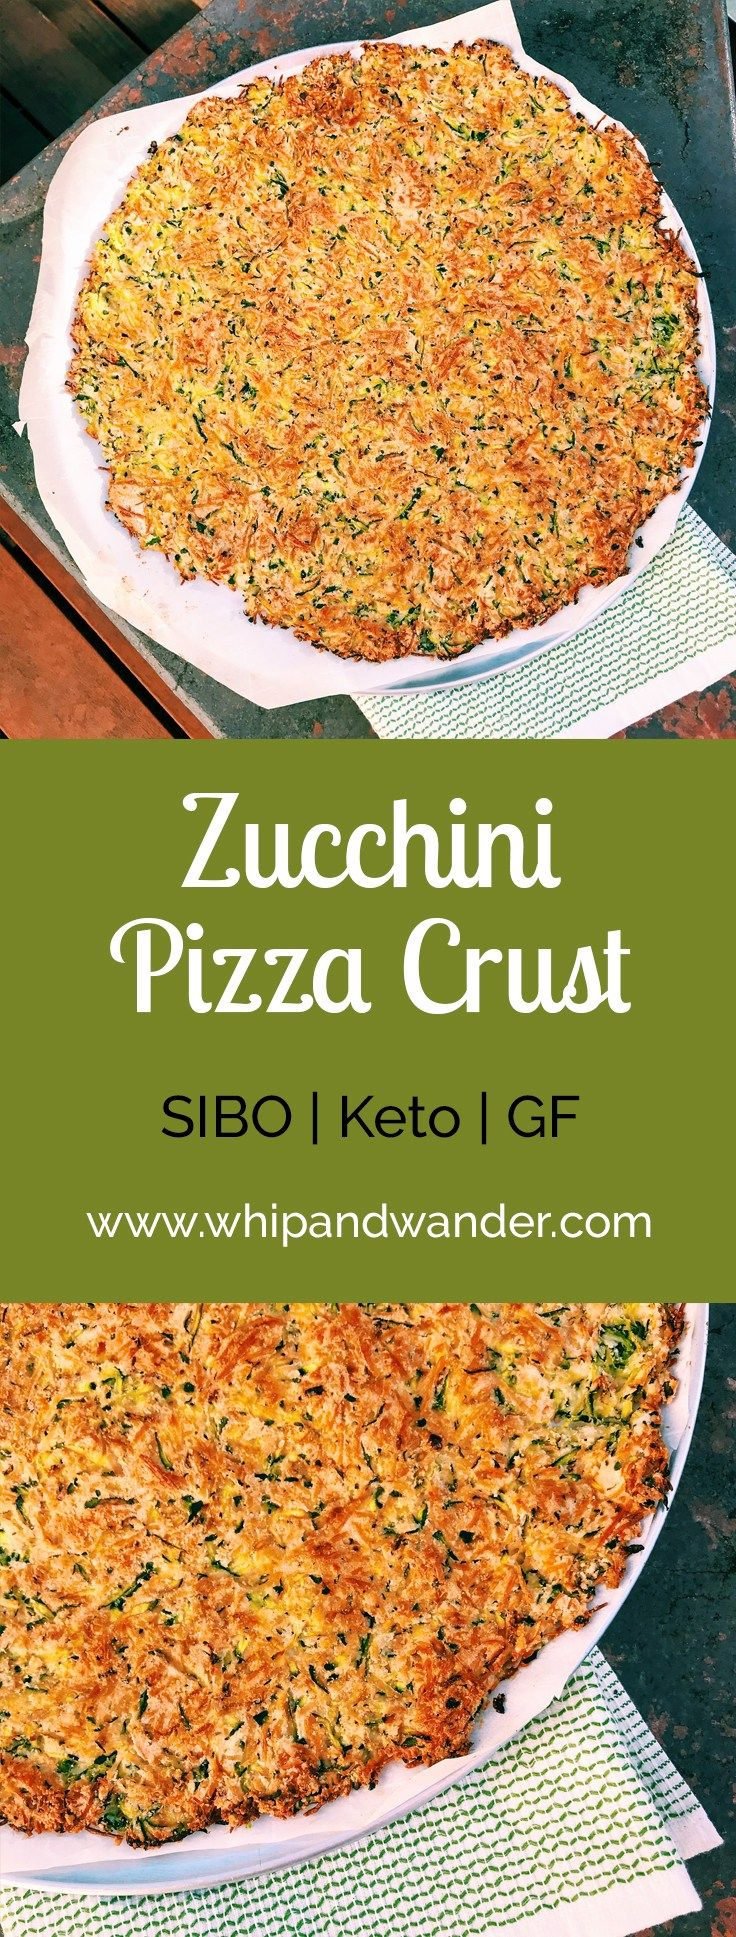 Zucchini Pizza Crust - Whip & Wander